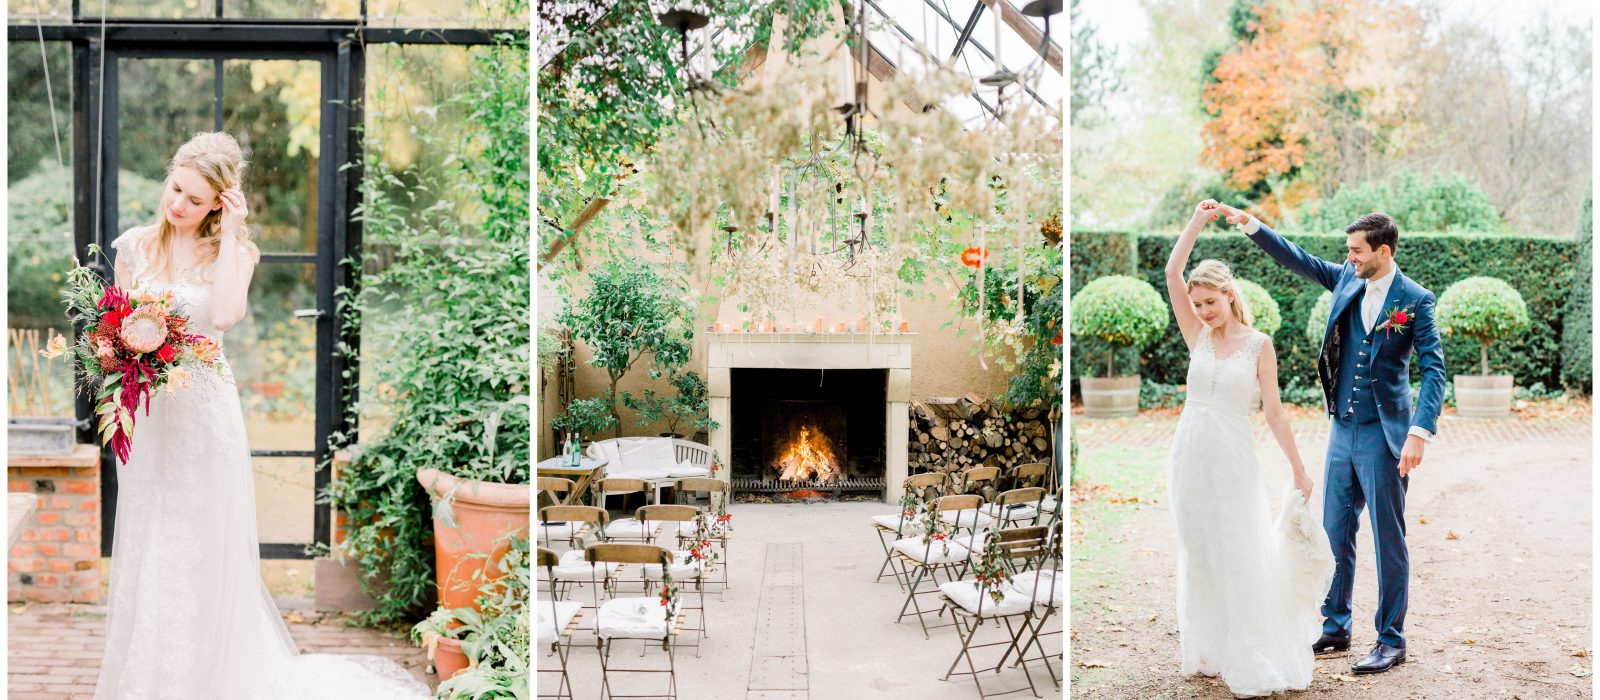 Nozza wedding planner & wedding stylist